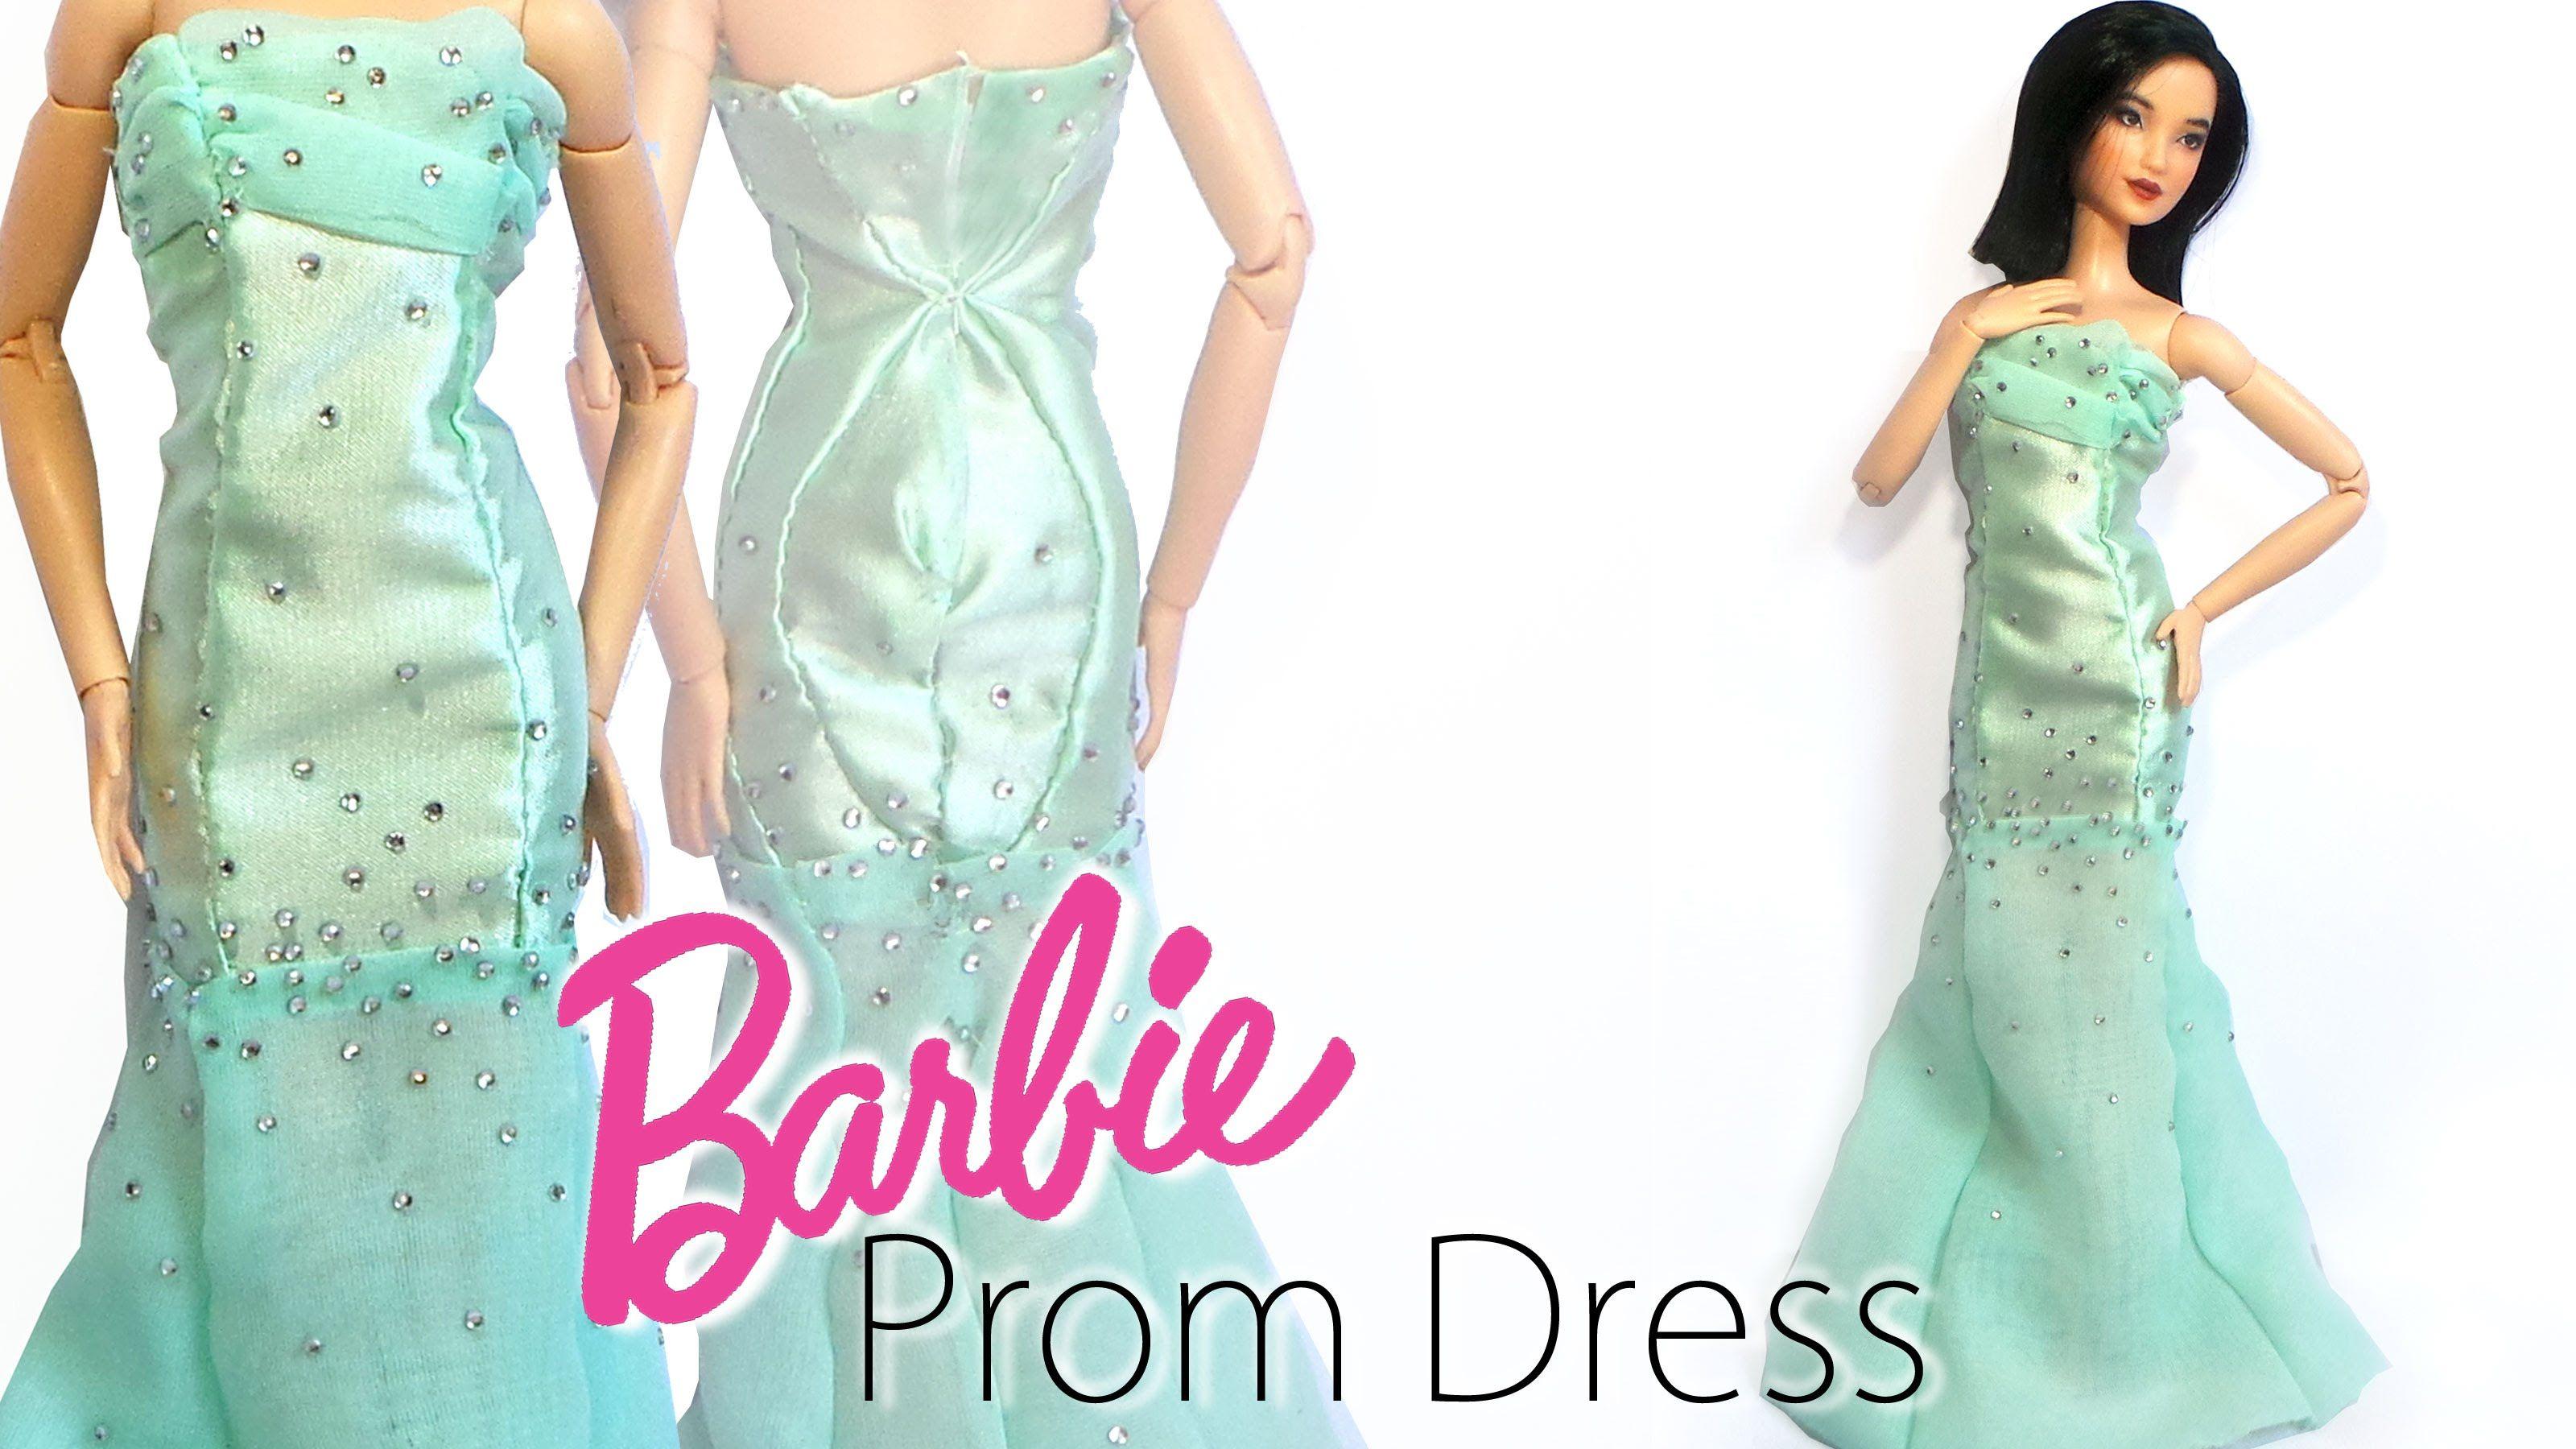 How to: Doll Prom Dress - Miniature/Barbie Prom Dress Tutorial ...